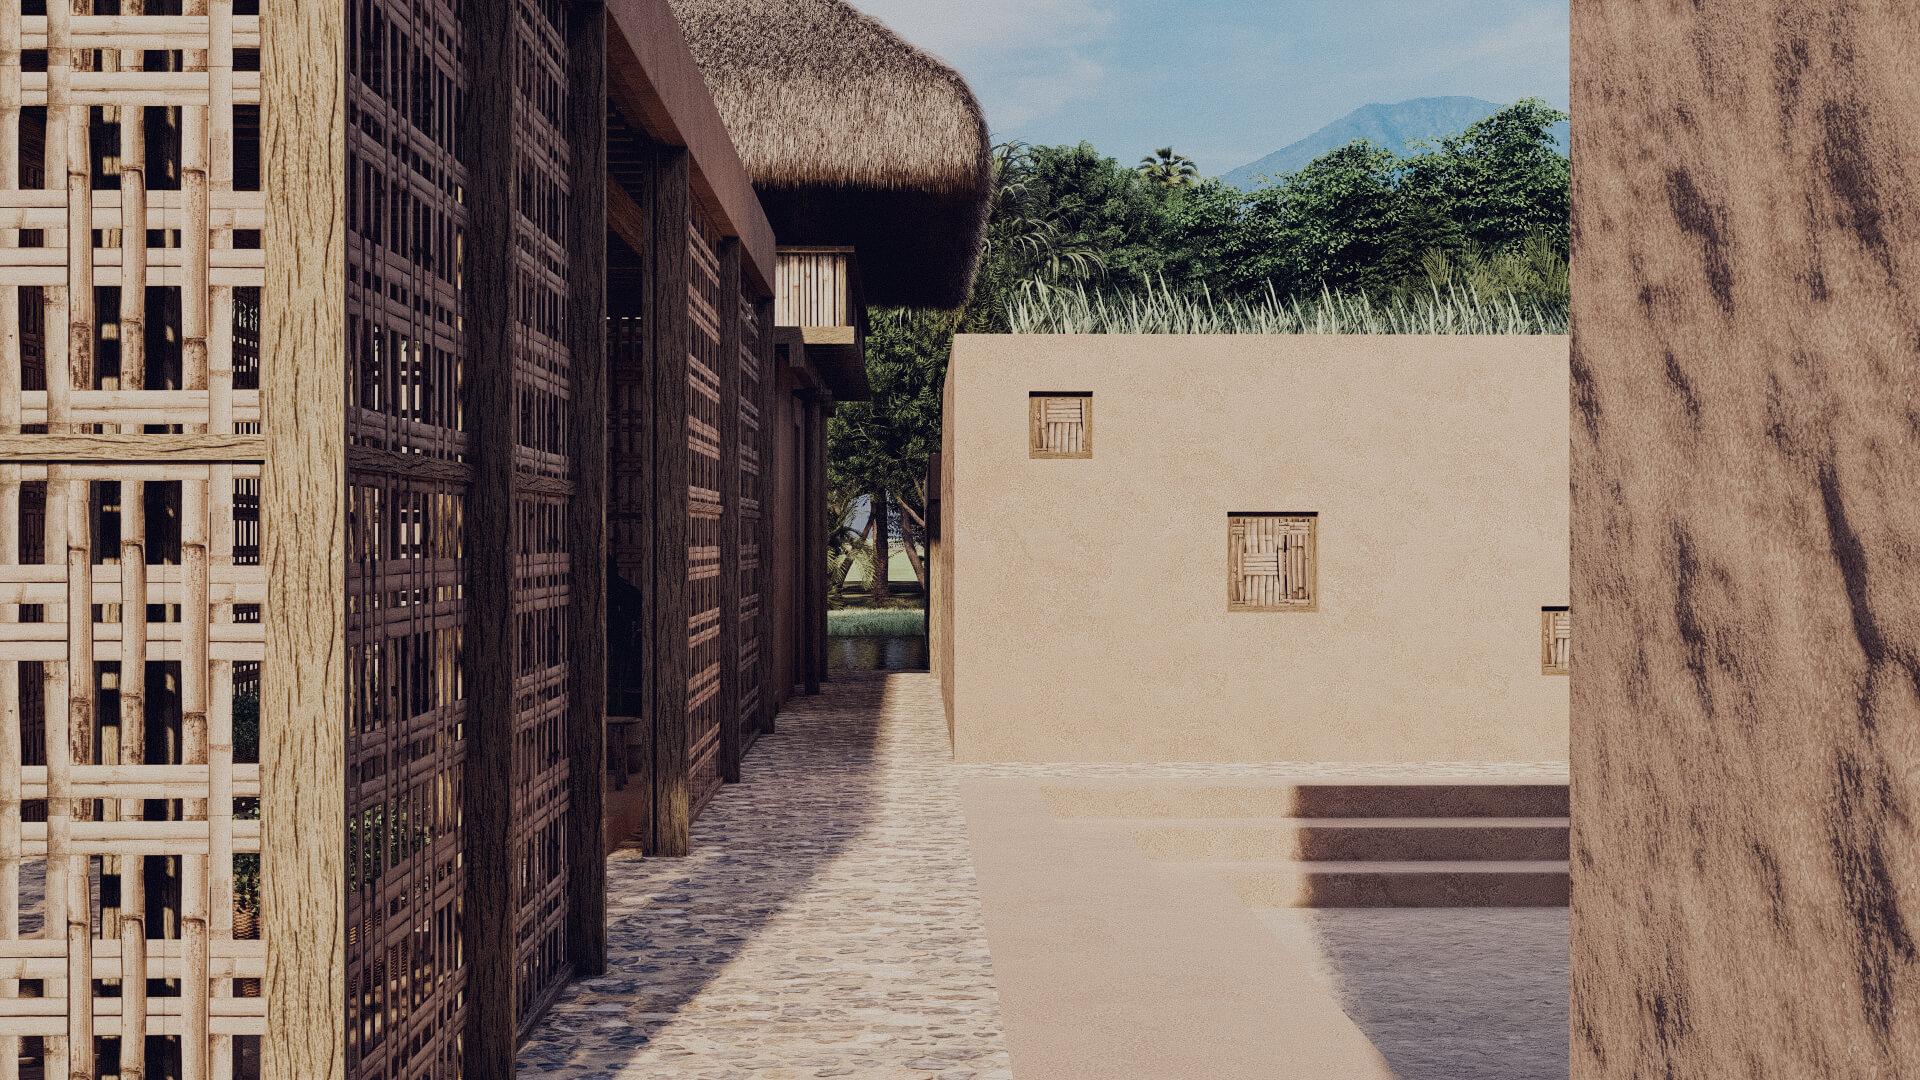 Rumah Besar Sembalun Lombok Architecture Pathway